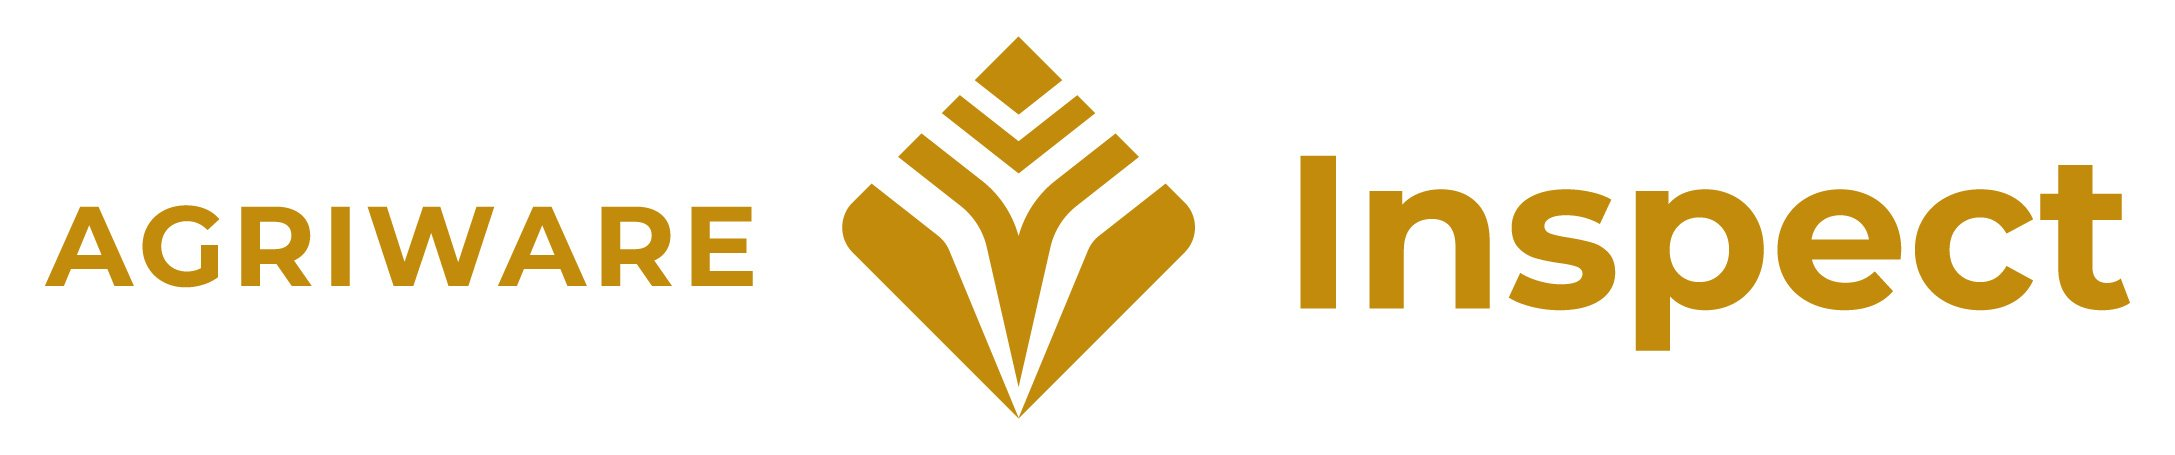 AGRIWARE-logo-2019-INSPECT-[RGB]